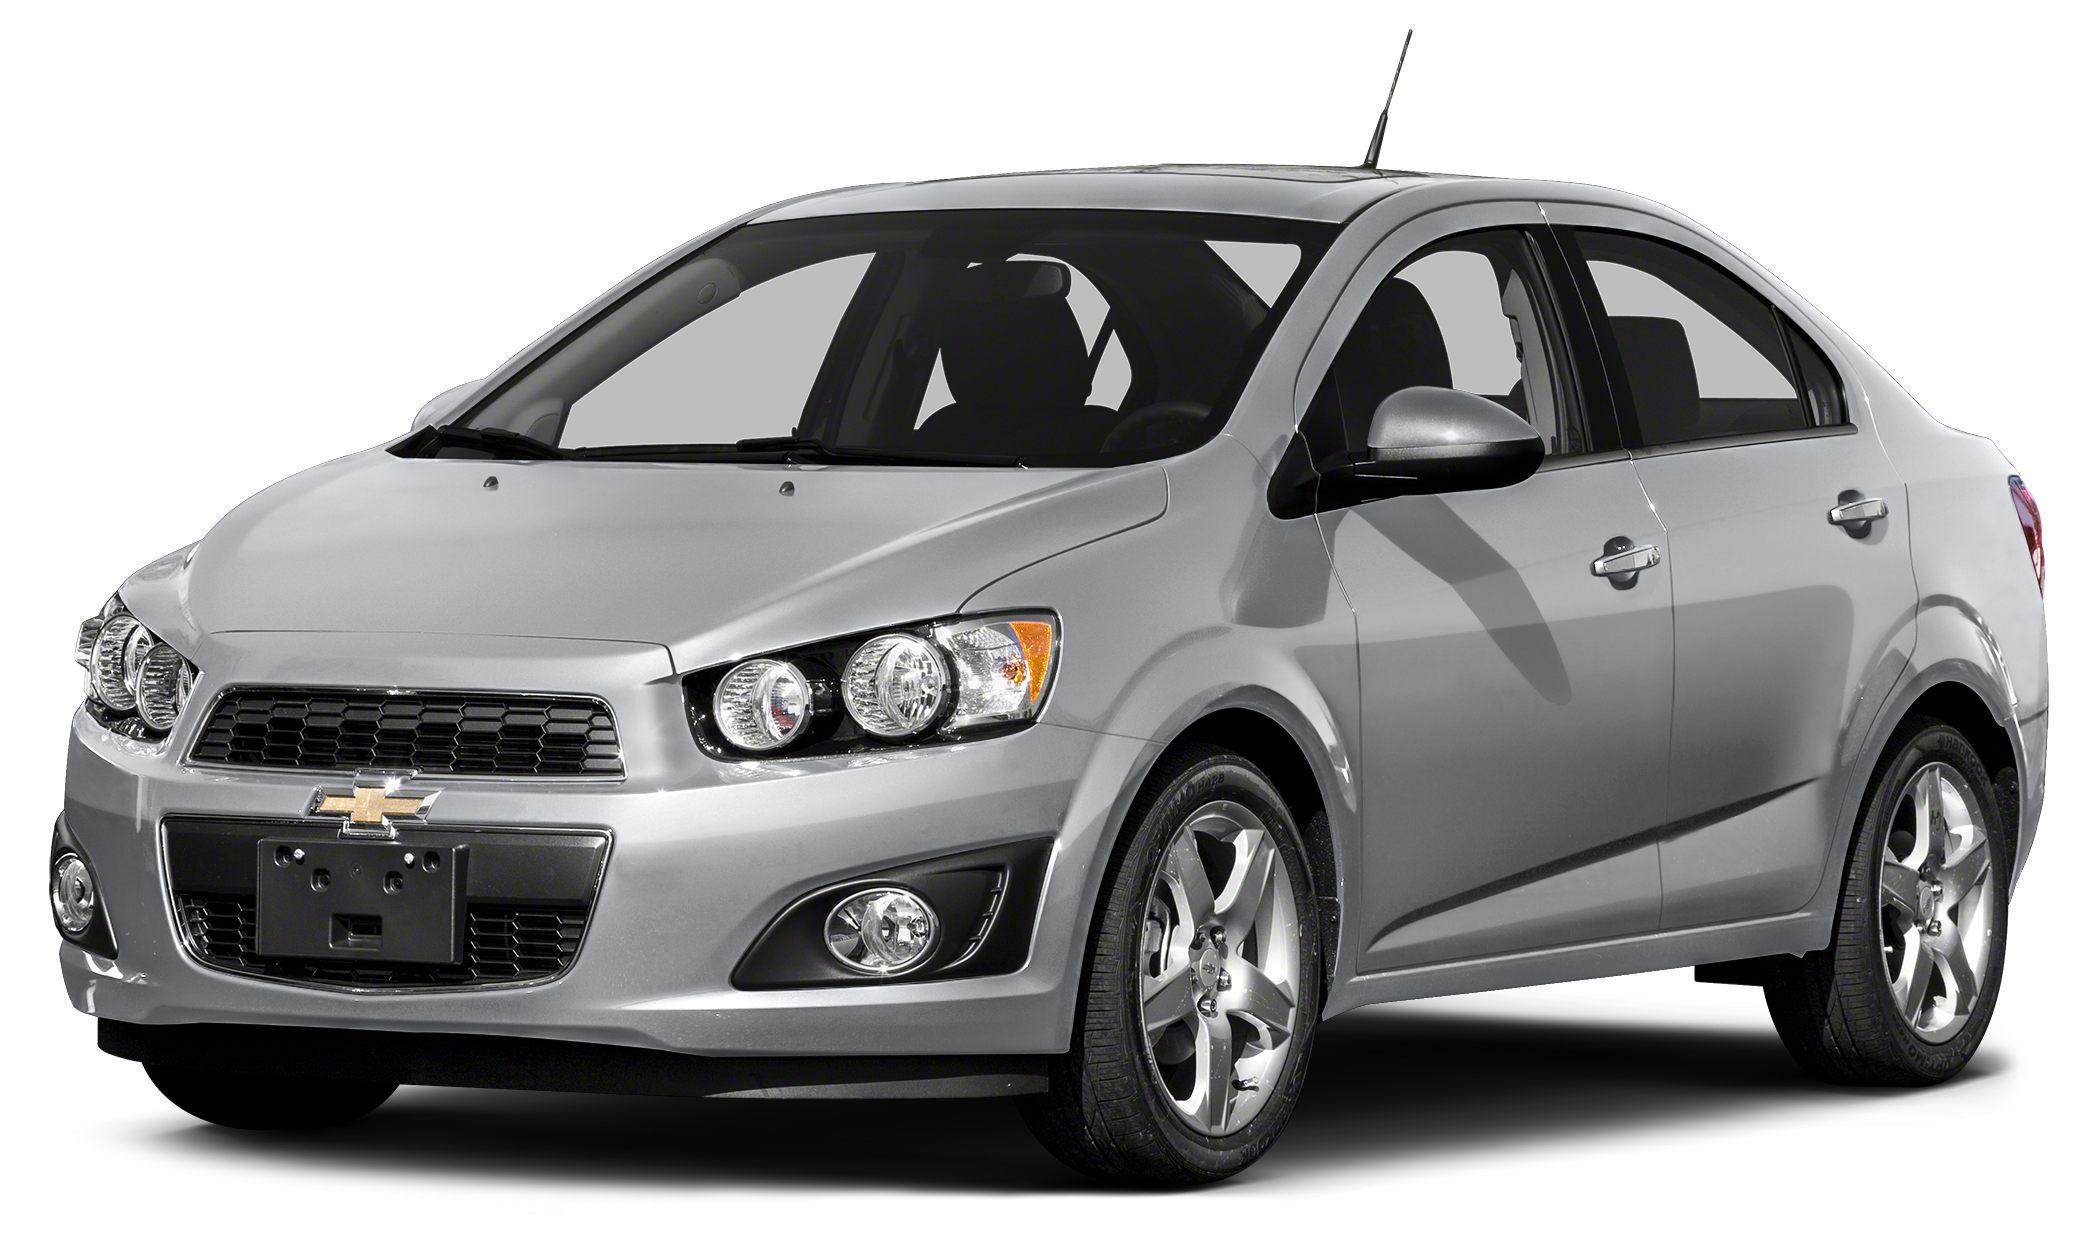 2015 Chevrolet Sonic LTZ ONLY 10724 Miles EPA 37 MPG Hwy27 MPG City Heated Seats Satellite Ra